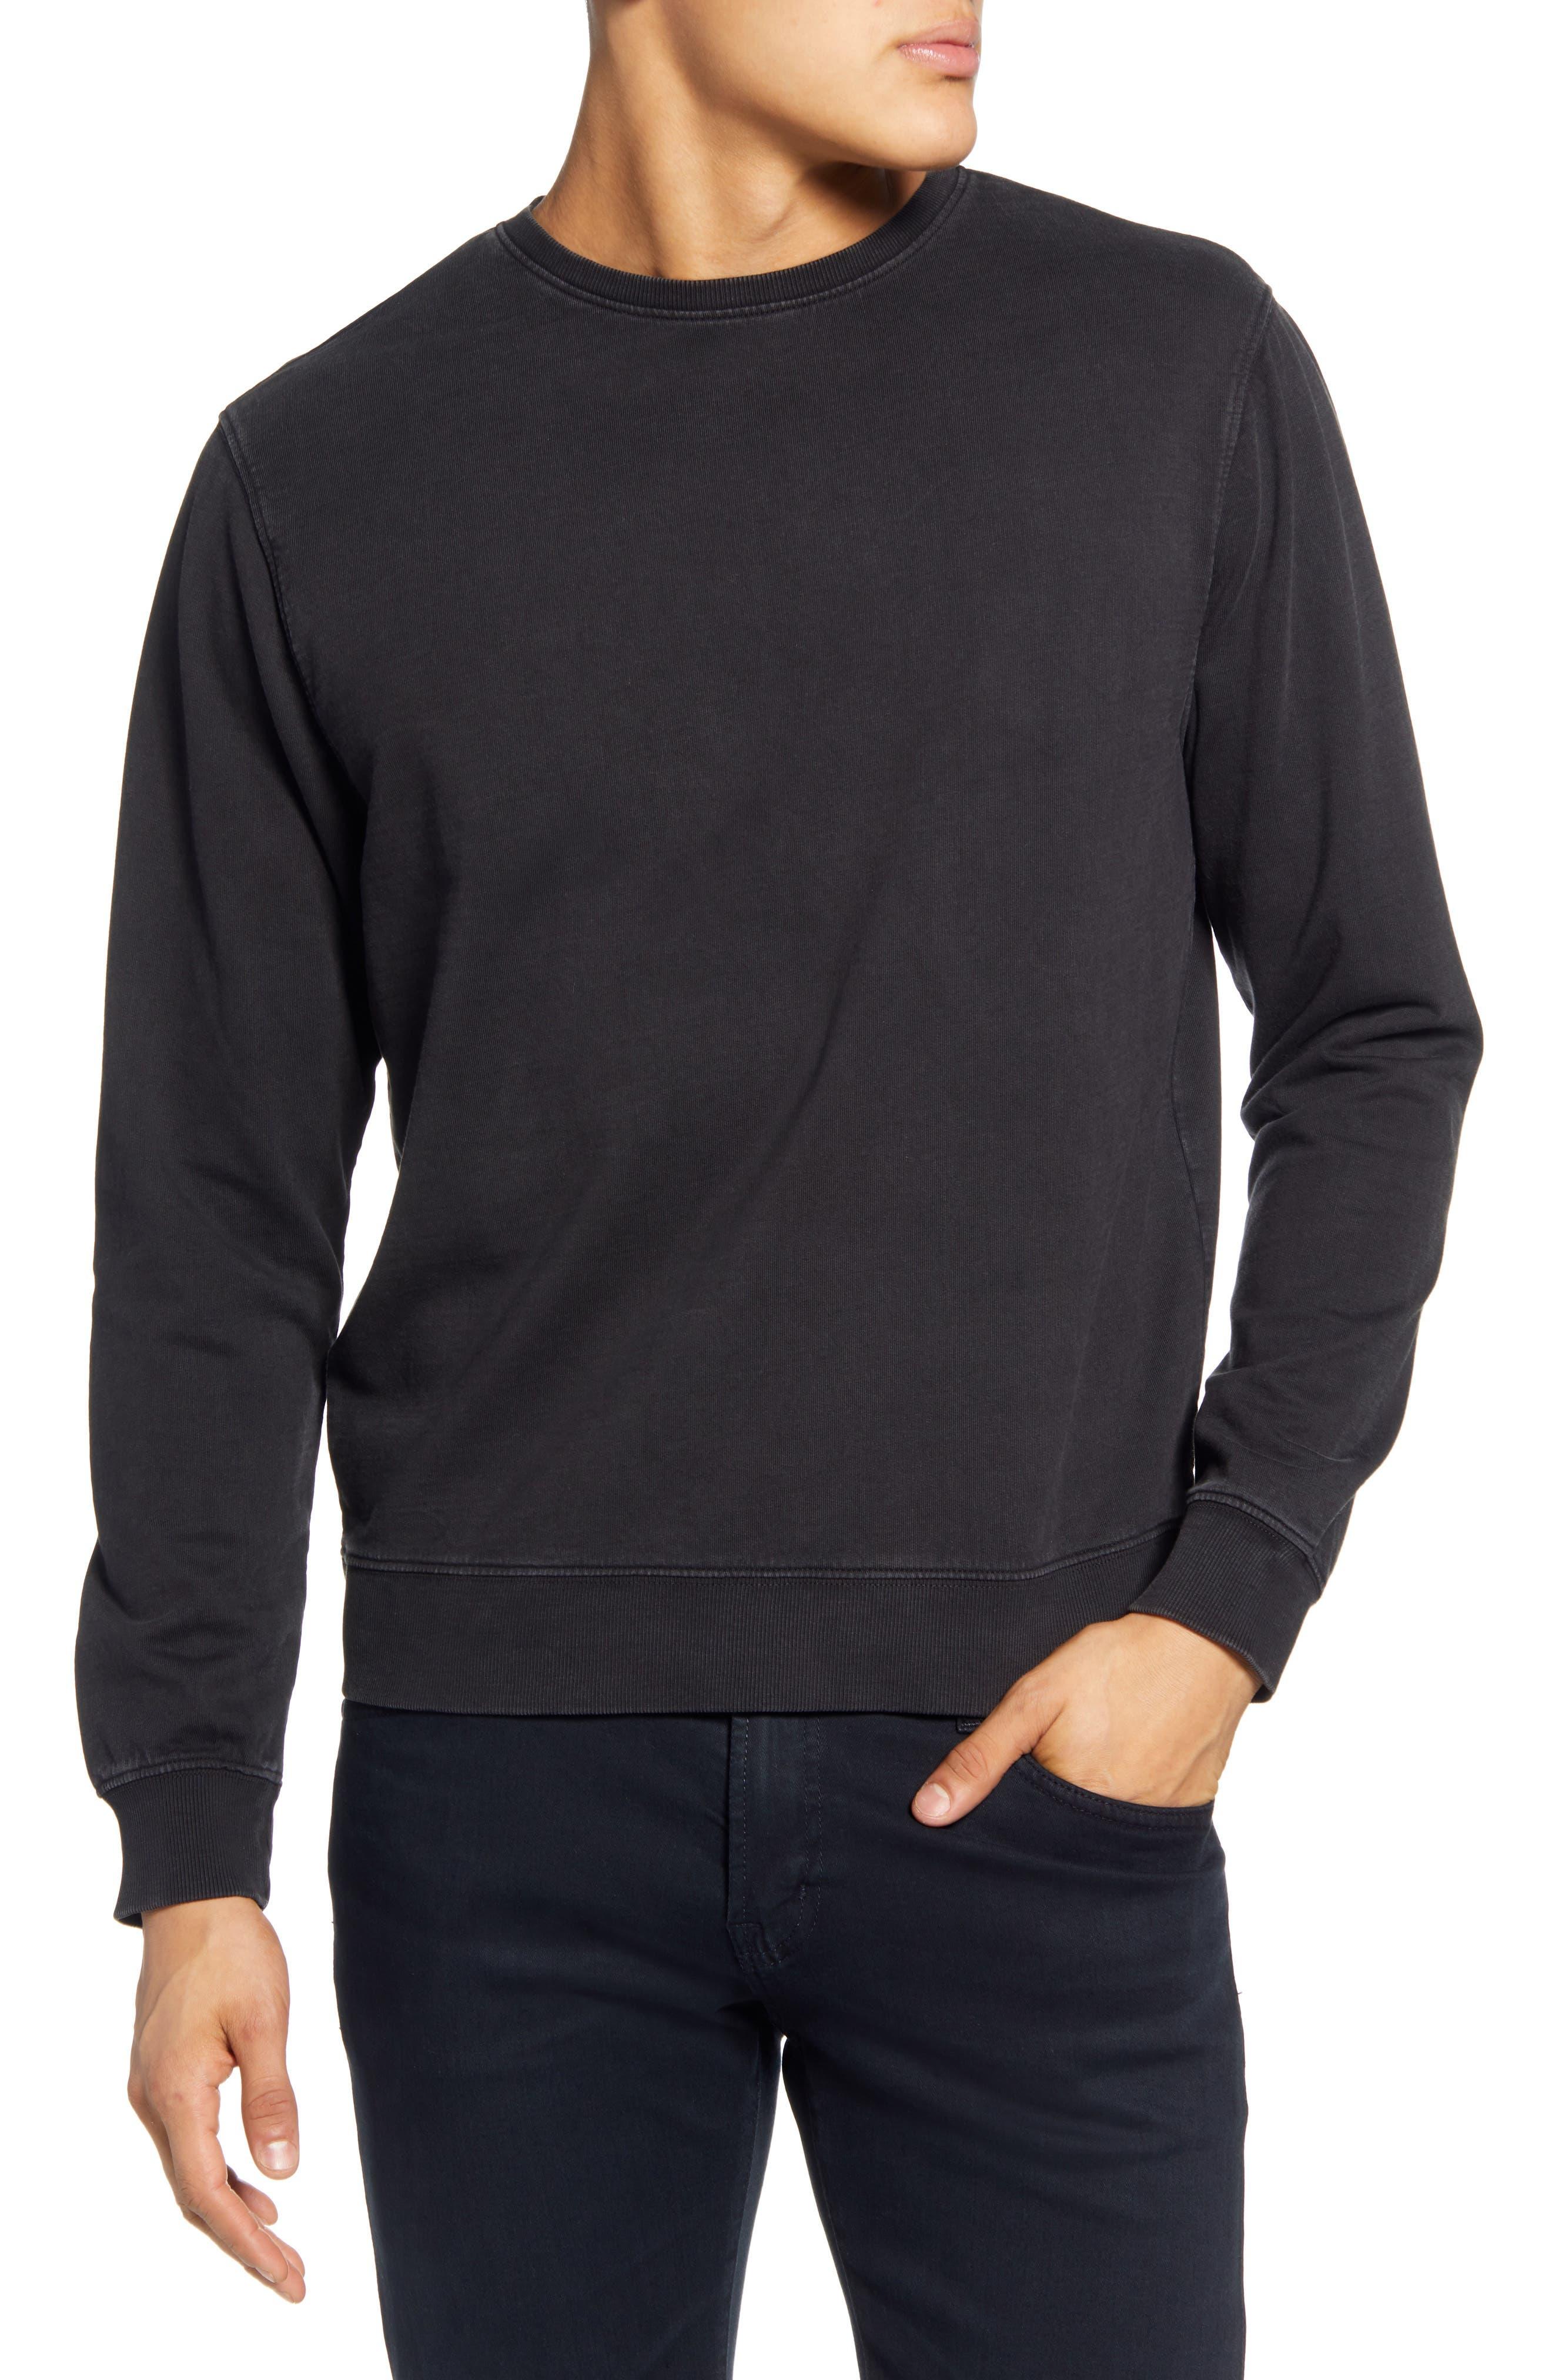 Image of BALDWIN Haring Slim Fit Long Sleeve T-Shirt